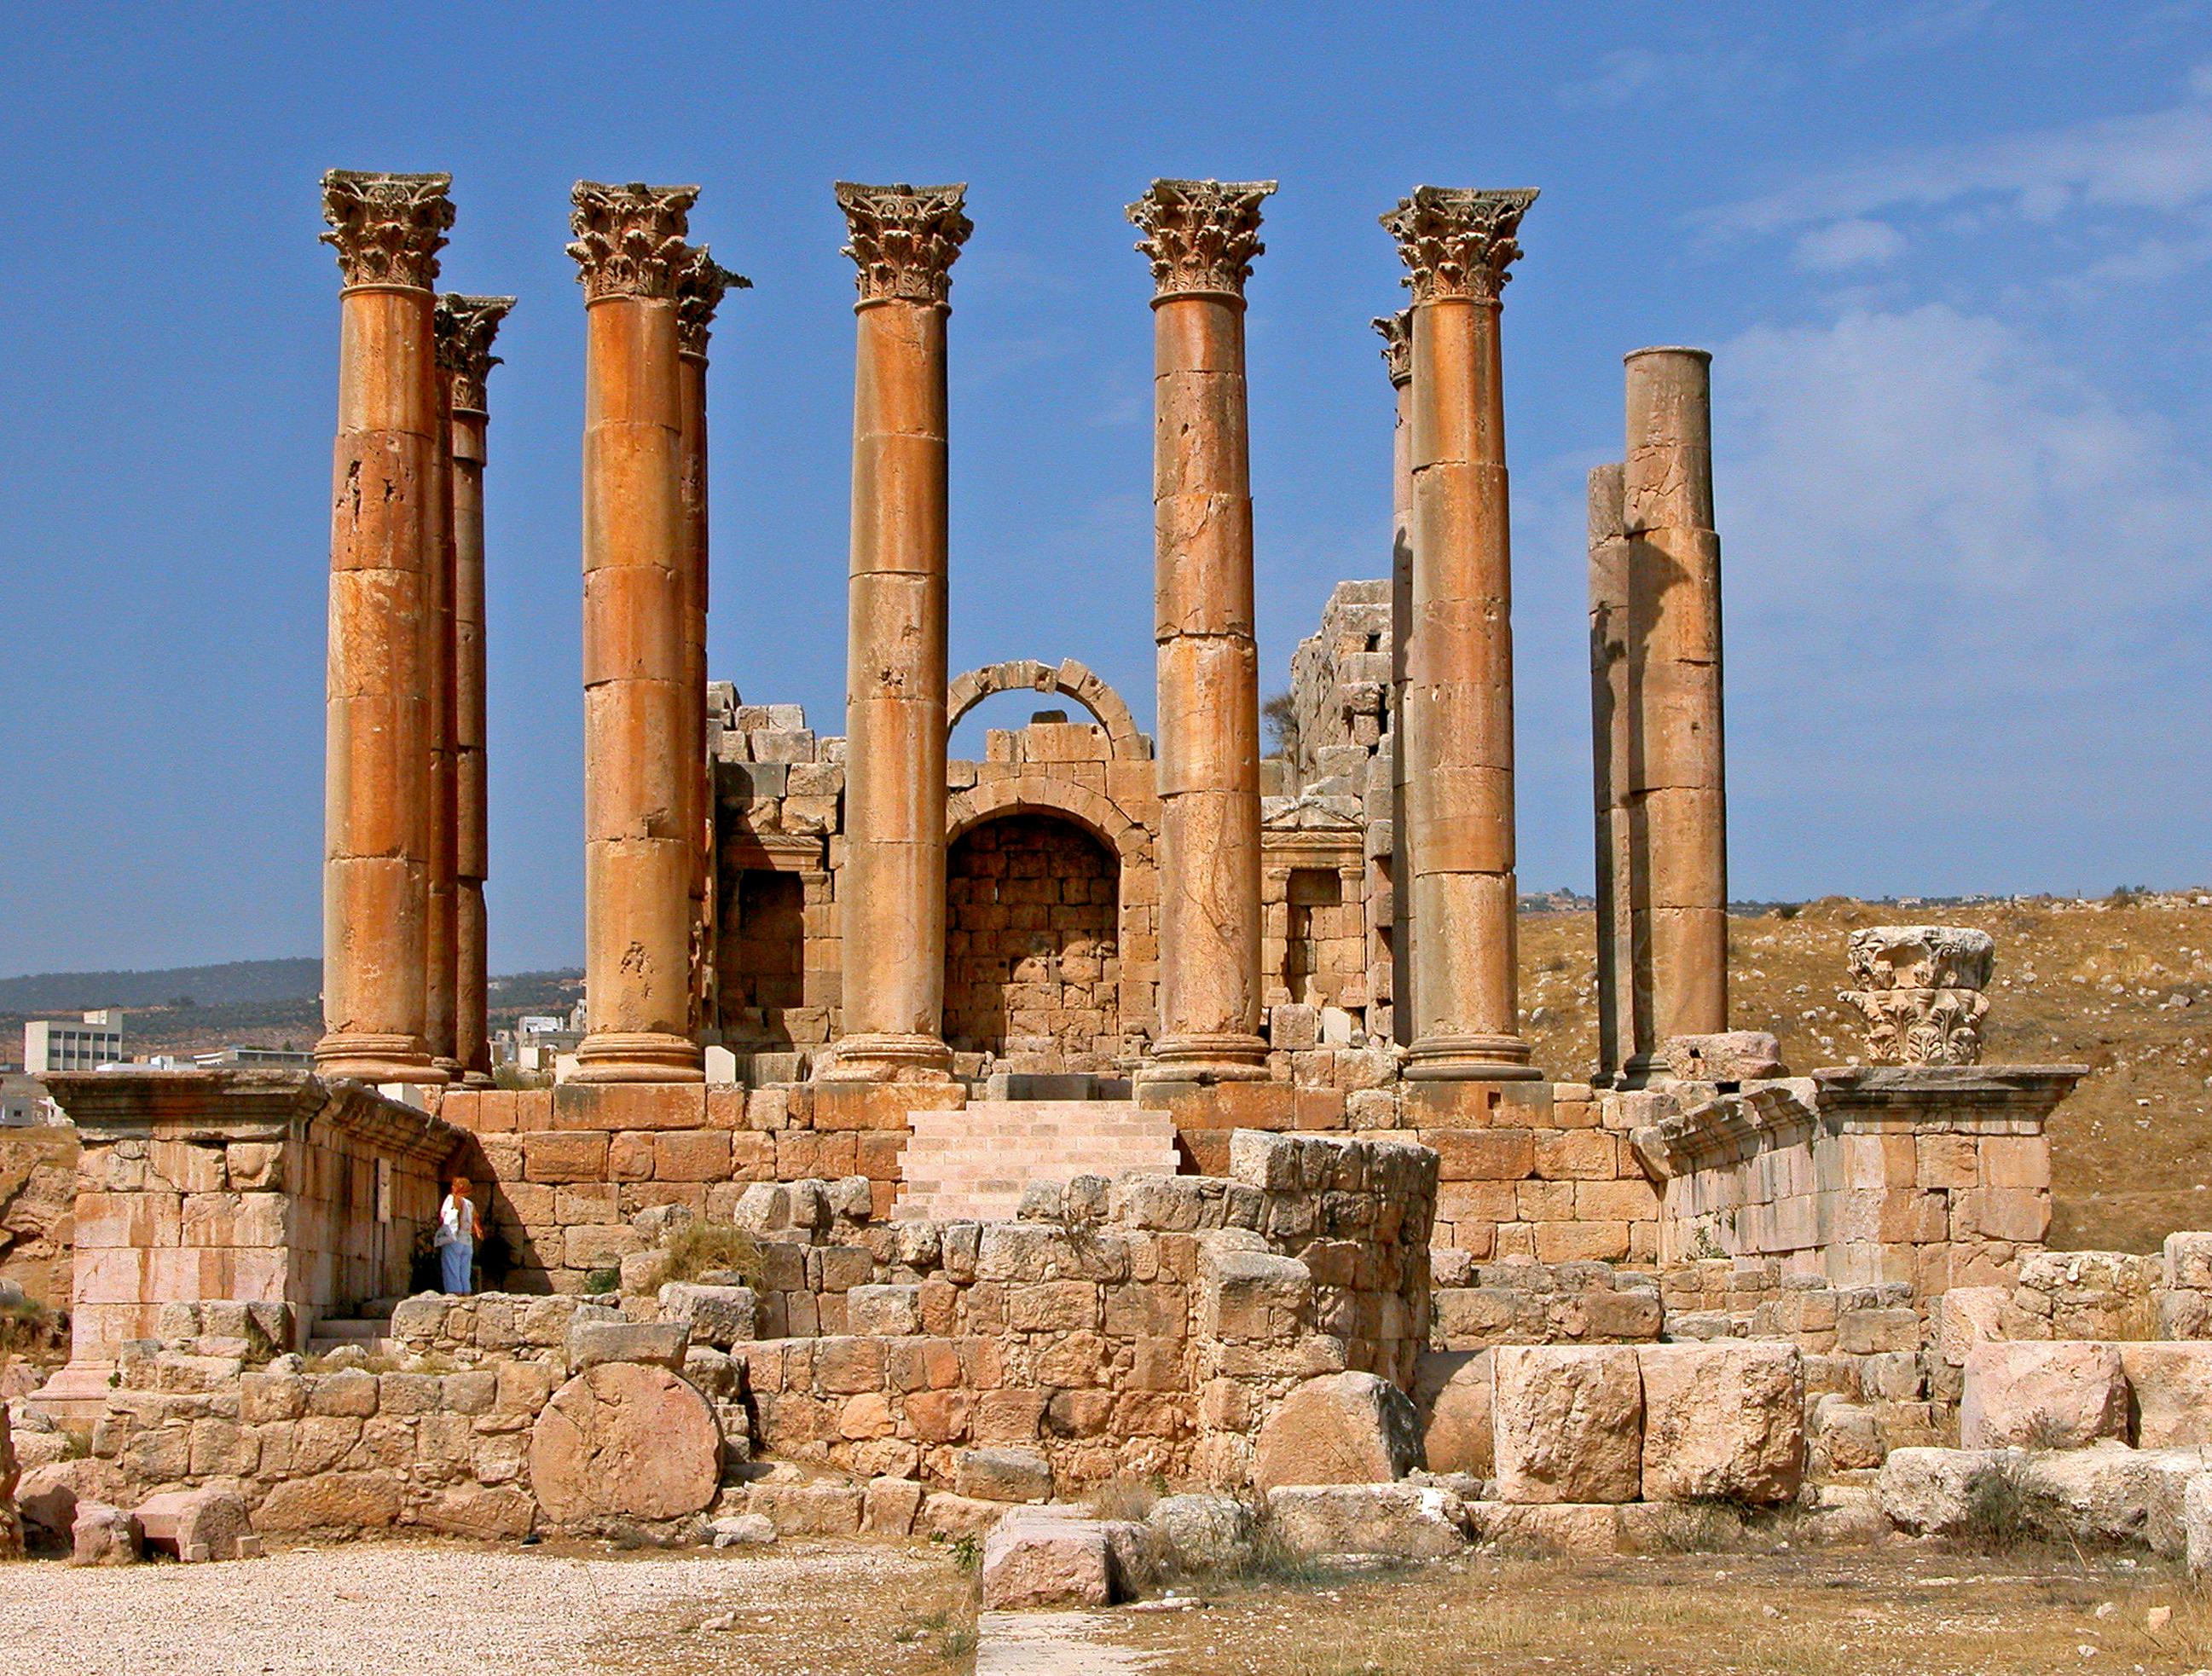 File:Jordan-16A-085 - Temple of Artemis.jpg - Wikimedia ...